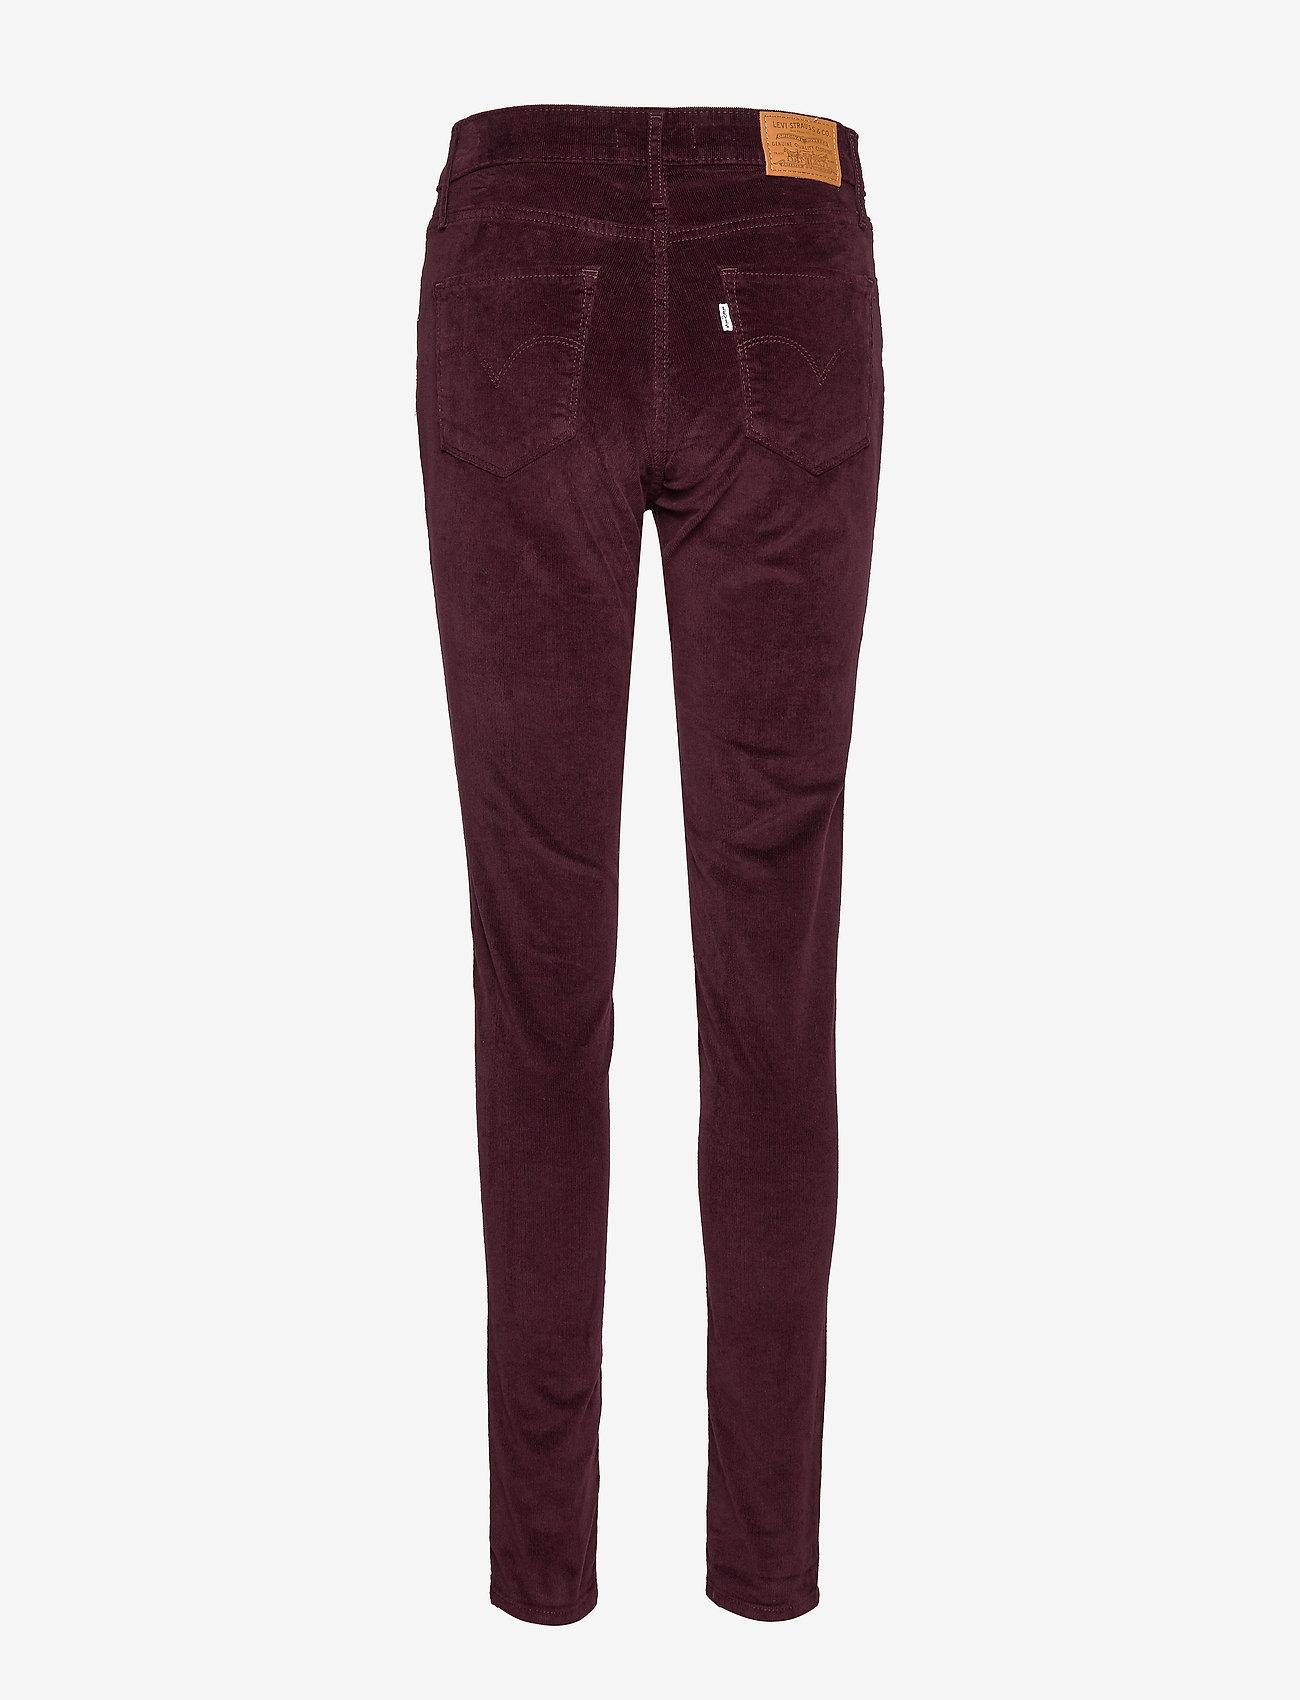 LEVI´S Women - 721 HIGH RISE SKINNY MALBEC LU - broeken med skinny fit - reds - 1